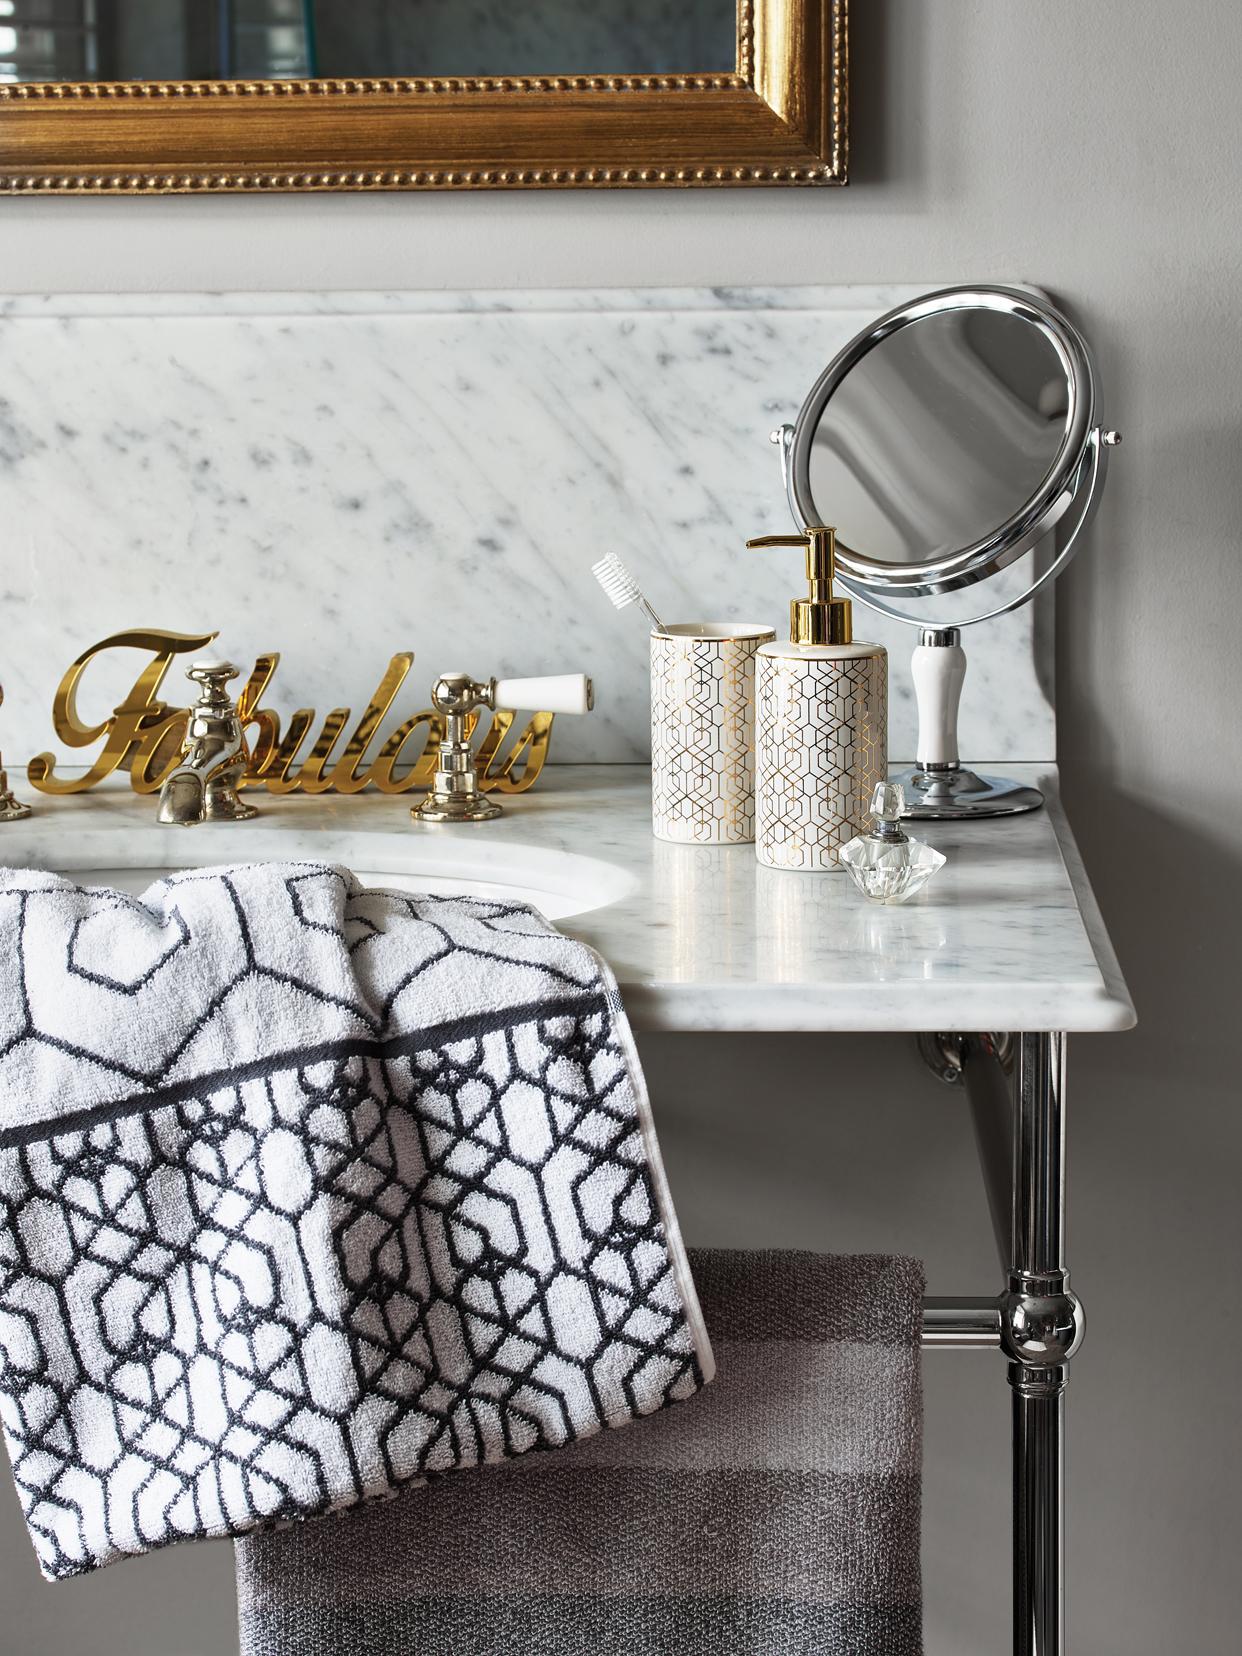 'Fabulous' bath sign - £6, Gold Geo tumbler - £3, Gold Geo dispenser - £5, White and Chrome stand mirror - £8, Grey Geo bath towel - £6, Savoy Stripe bath towel - £6.